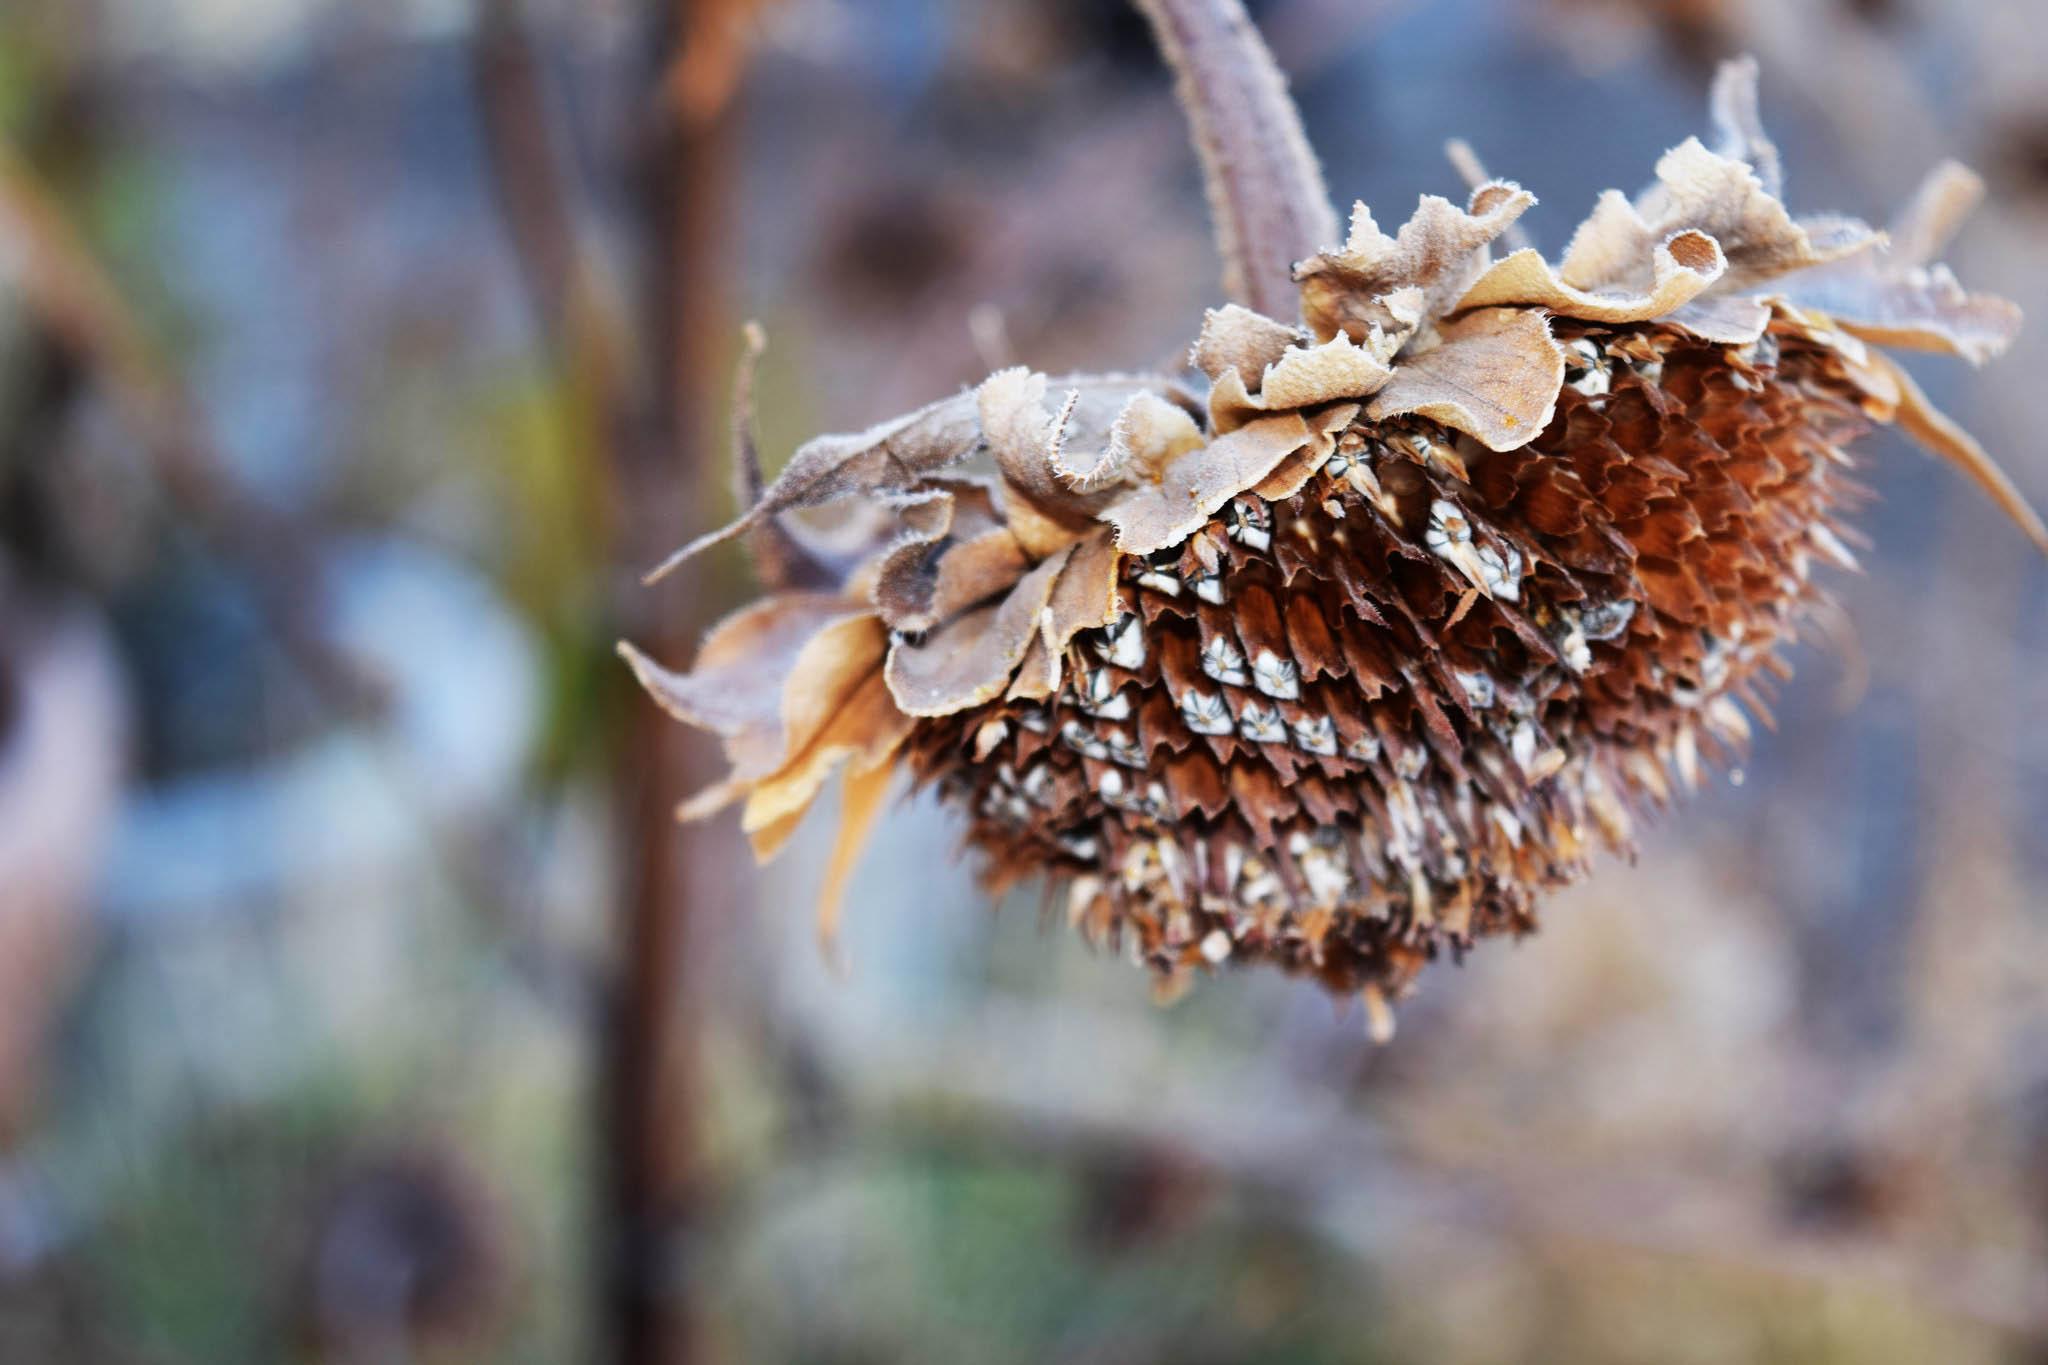 Strategic Garden Cleanup Creates Garden Homes for Pollinators